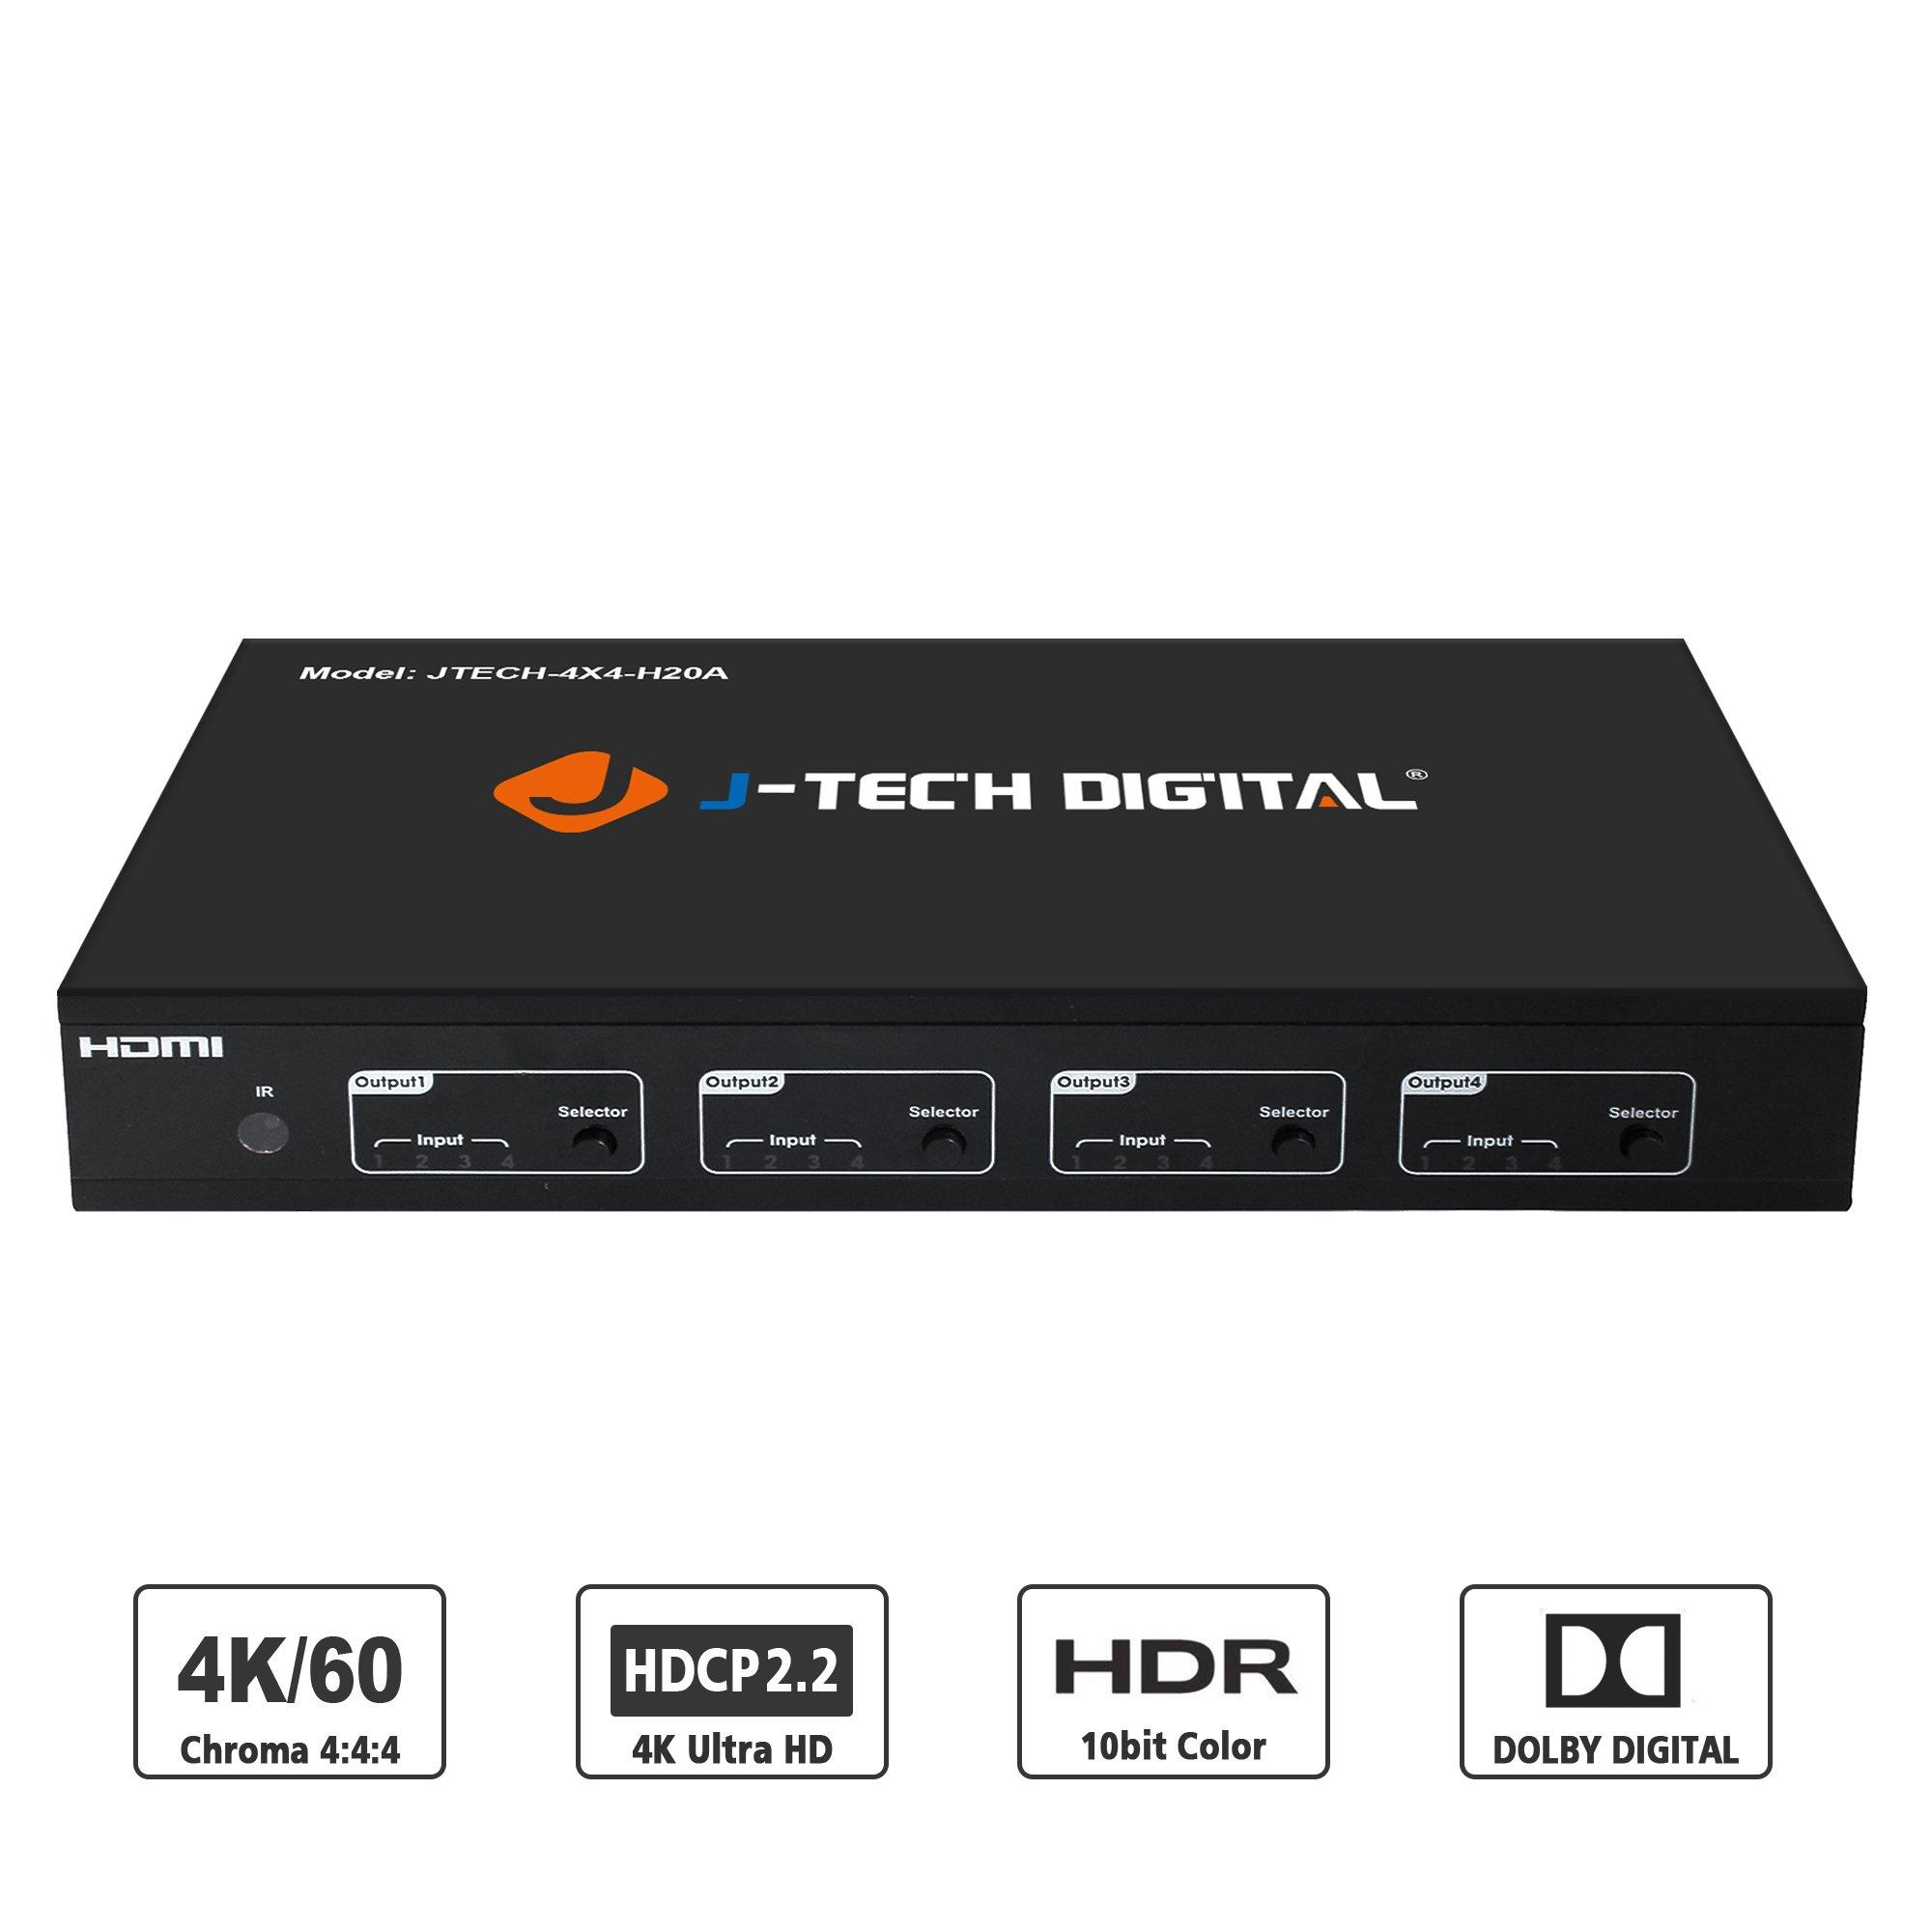 J-TECH DIGITAL 4K 60HZ 4X4 HDMI Matrix 4x4, YUV4:4:4 18Gbps Supports HDMI 2.0, HDCP 2.2/1.4 ,HDR, EDID, IR Remote Control, RS232 Control, Web GUI Control and SPDIF AUDIO Output